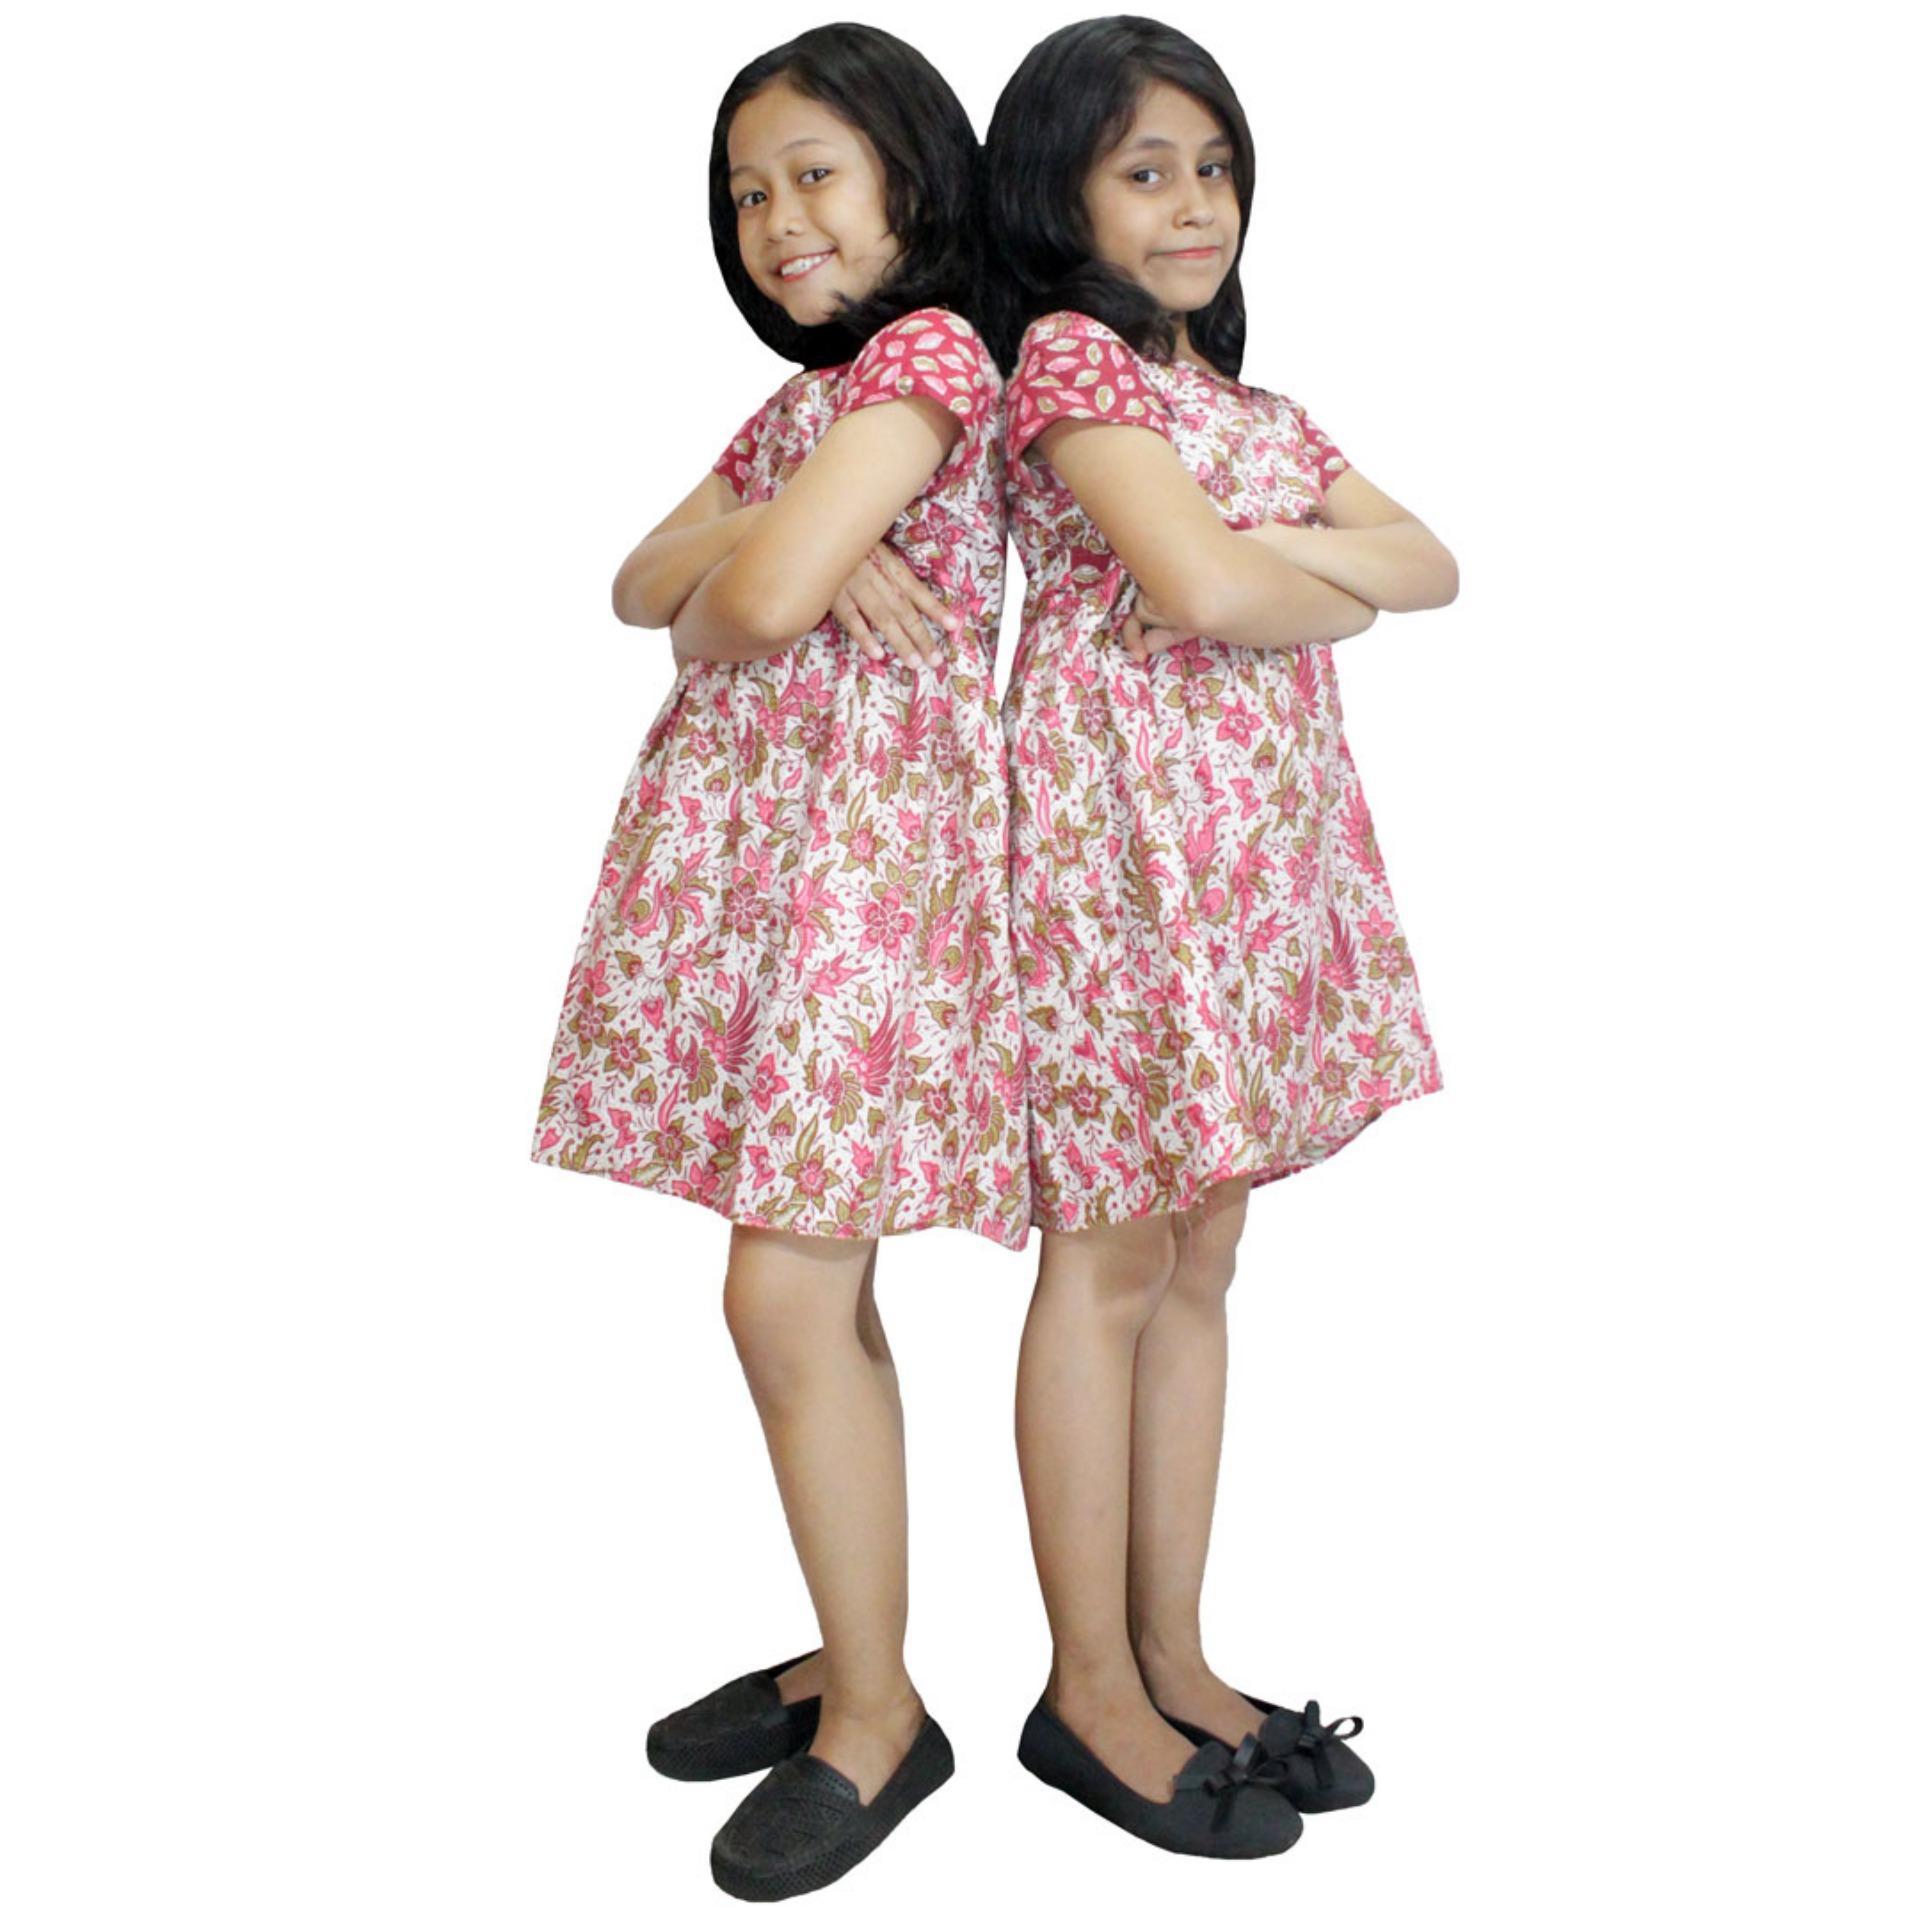 Dress Merah Batik Anak, Baju Tidur Anak, Piyama Anak, Ukuran XL Usia 5-6 Tahun (DKA003-01)